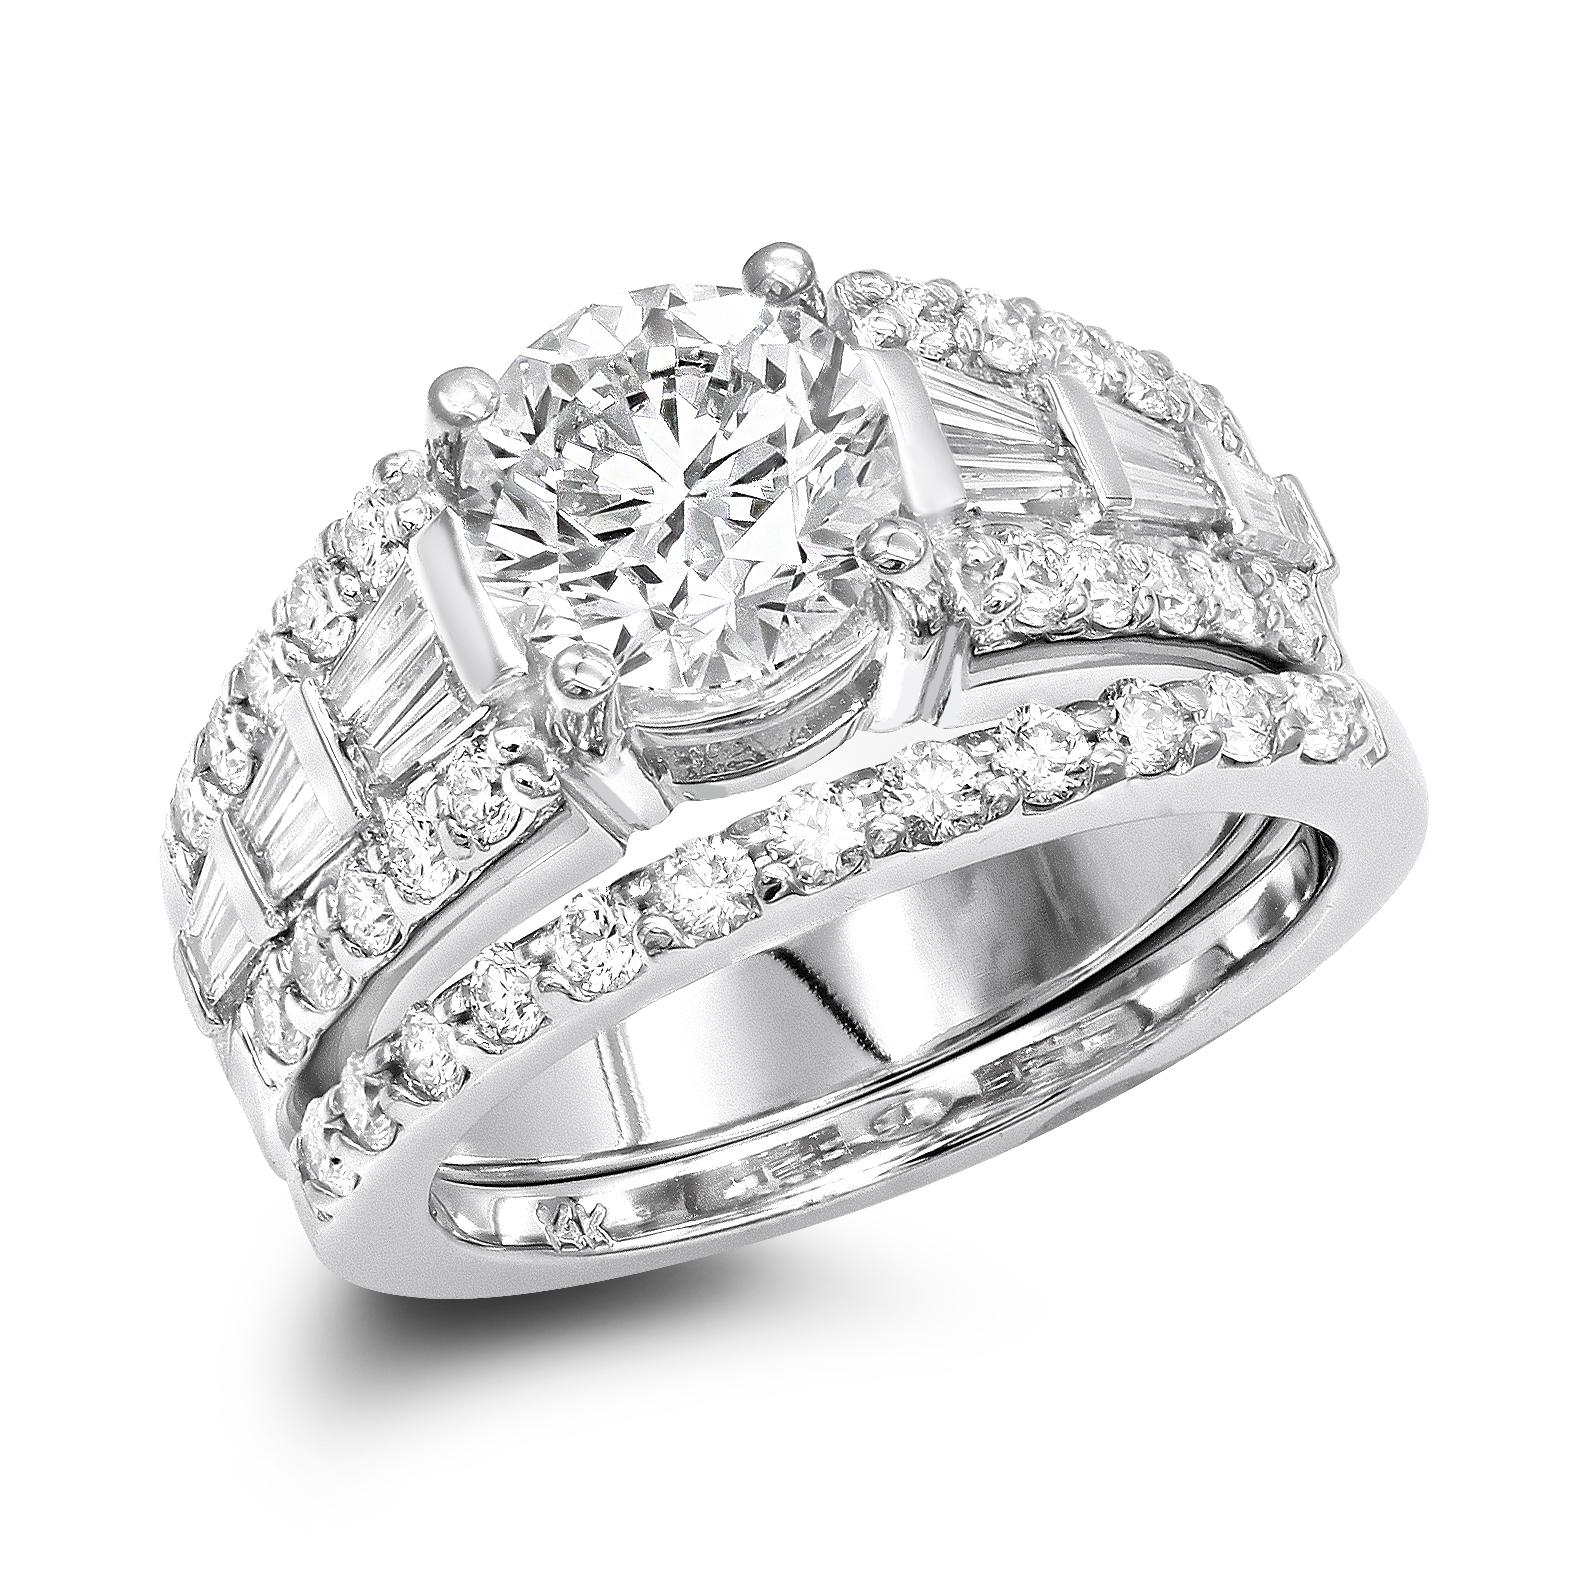 14K Gold Unique Designer G/VS Diamond Engagement Ring Set 3.75ct by Luxurman